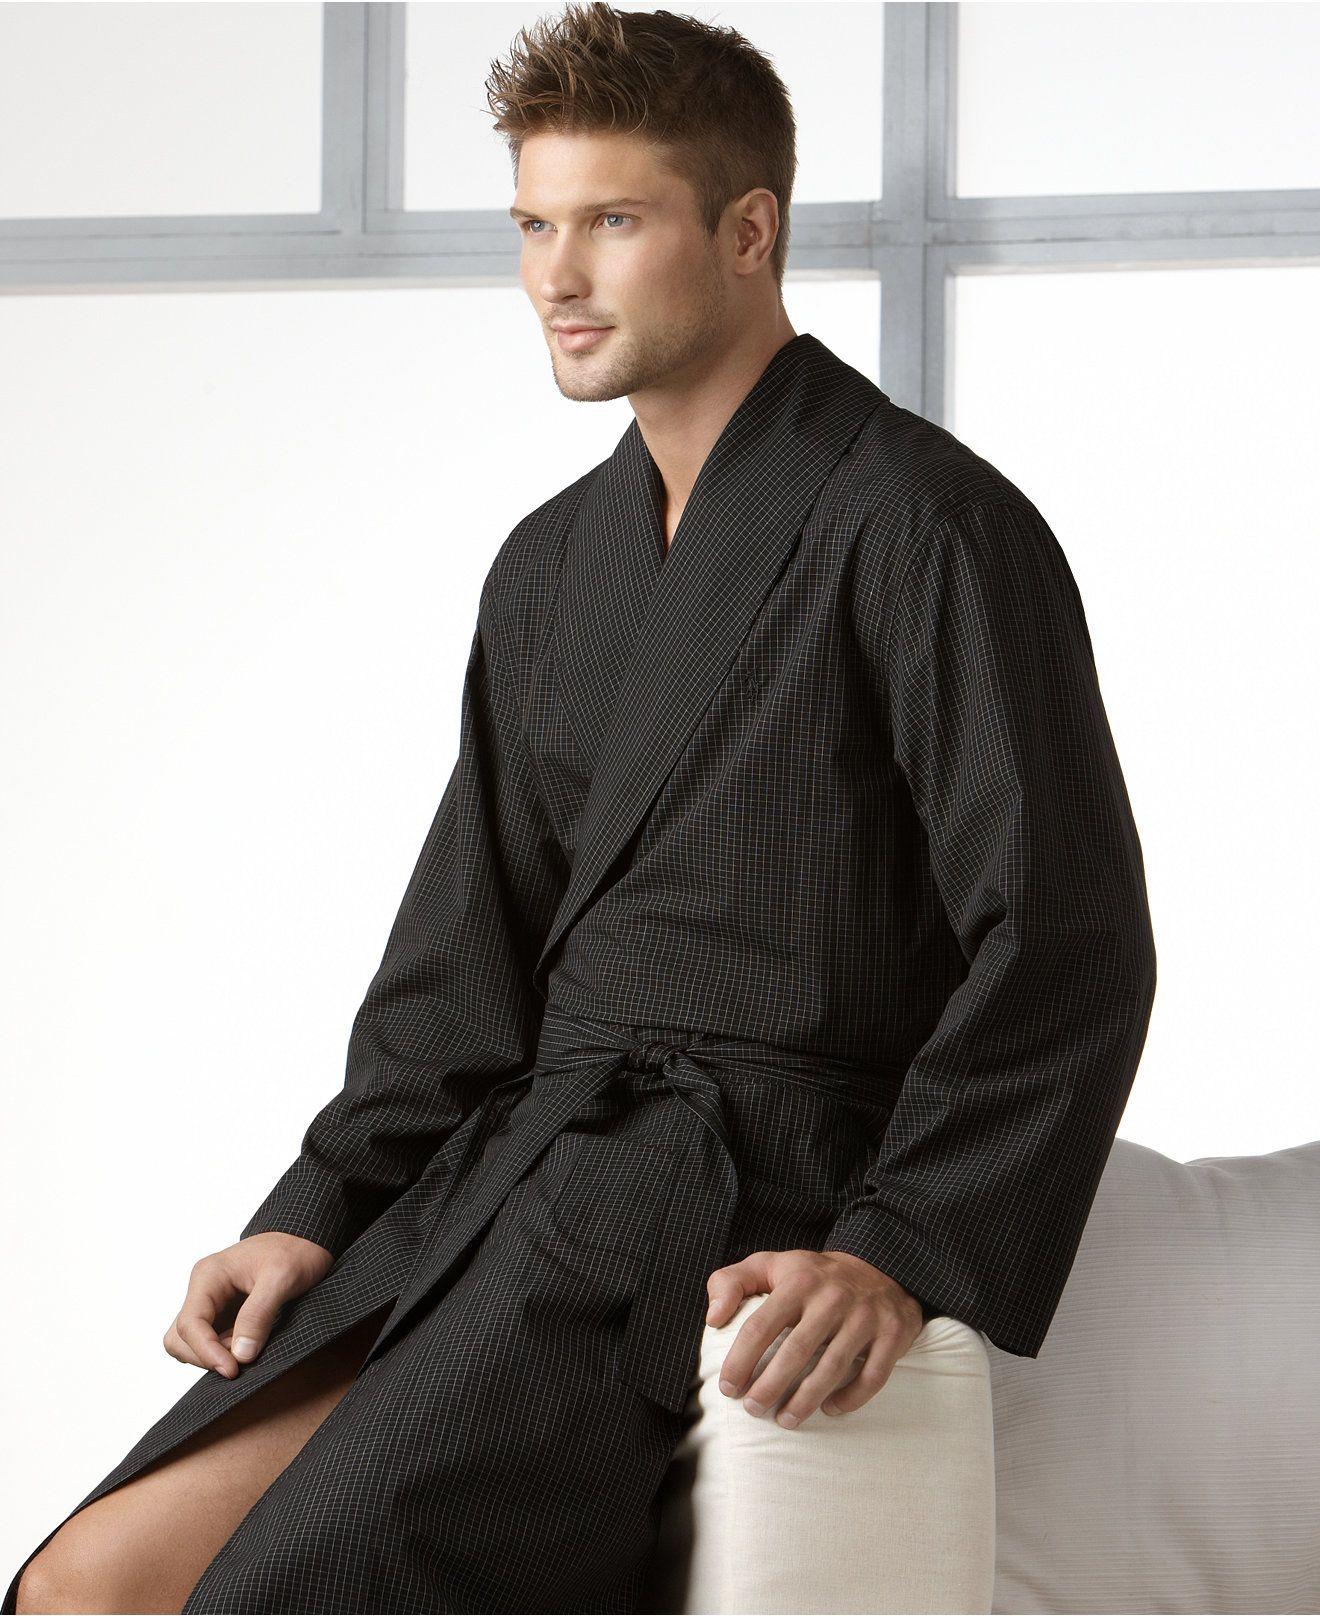 Modern Robe : modern, Ralph, Lauren, Men's, Sleepwear,, Modern, Plaid, Reviews, Pajamas, Robes, Macy's, Jackets, Fashion,, Dressed